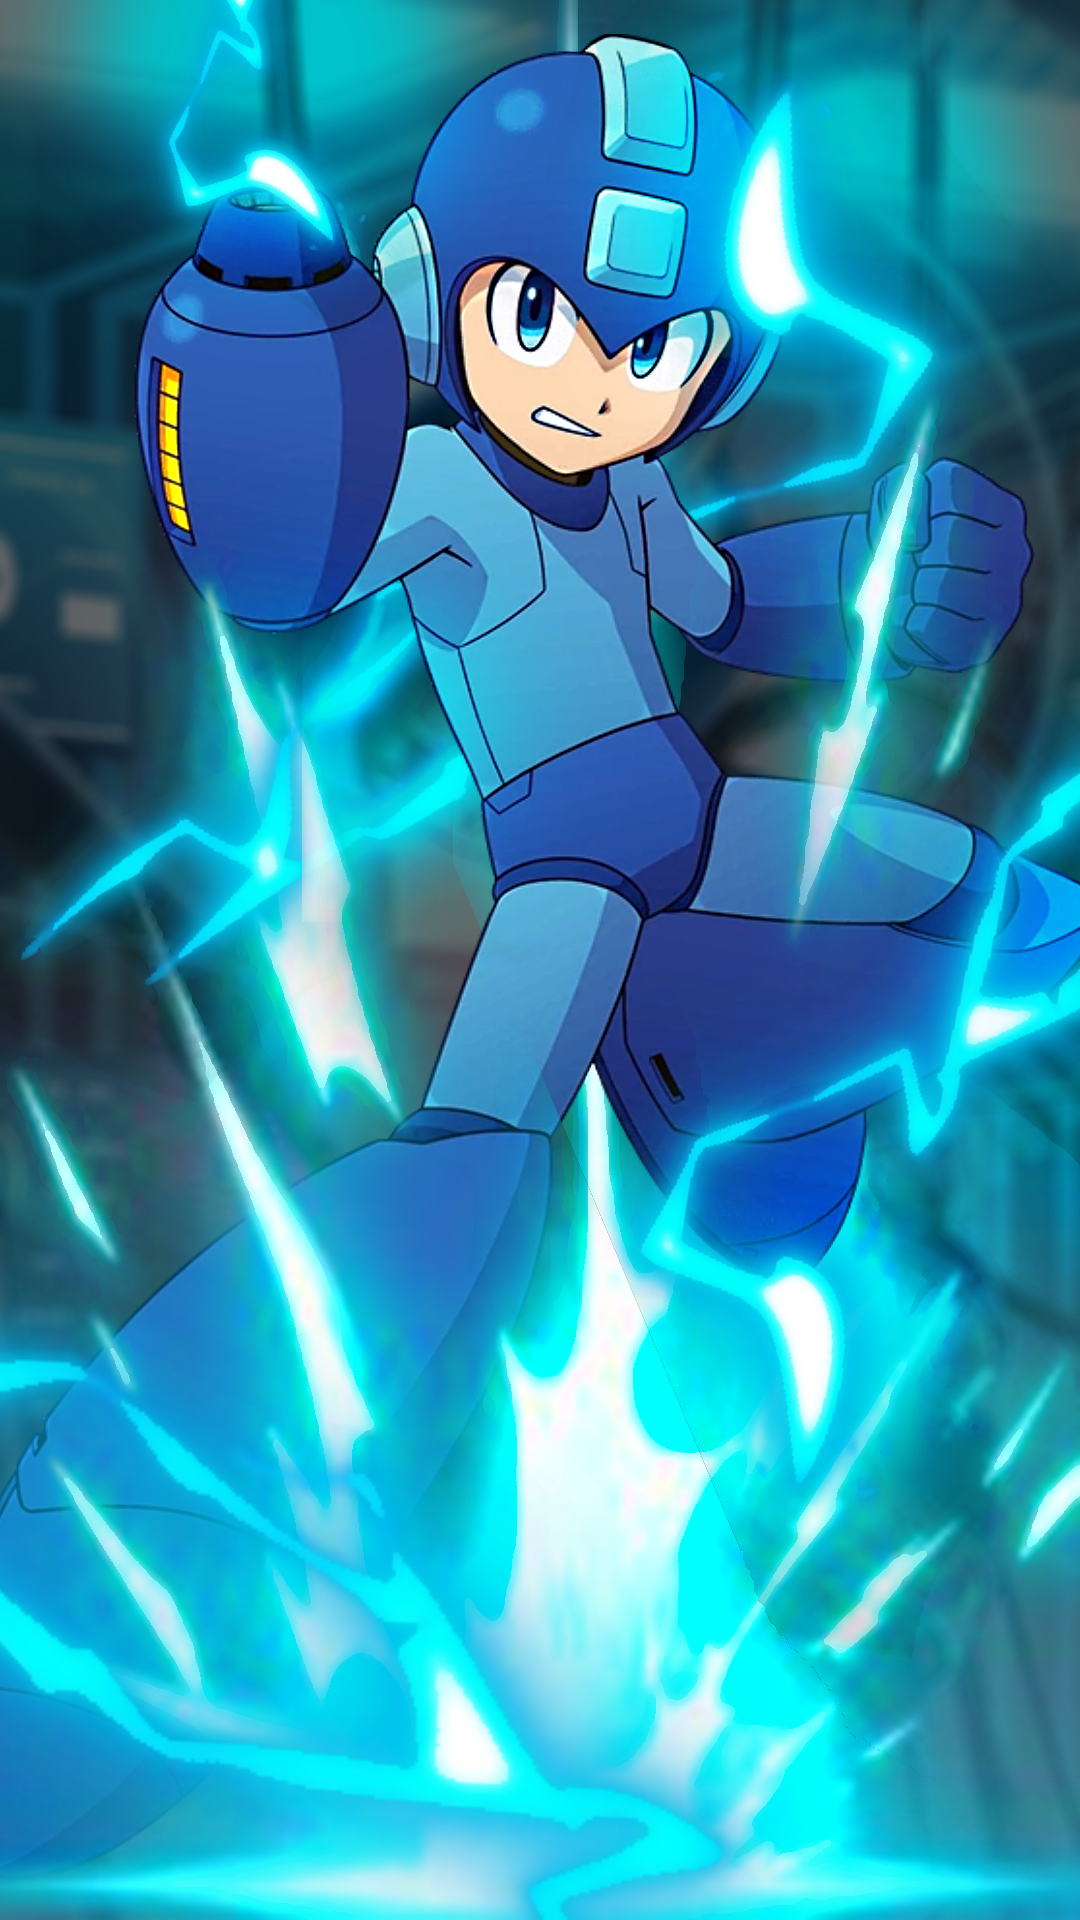 Mega Man Wallpapers Top Free Mega Man Backgrounds Wallpaperaccess